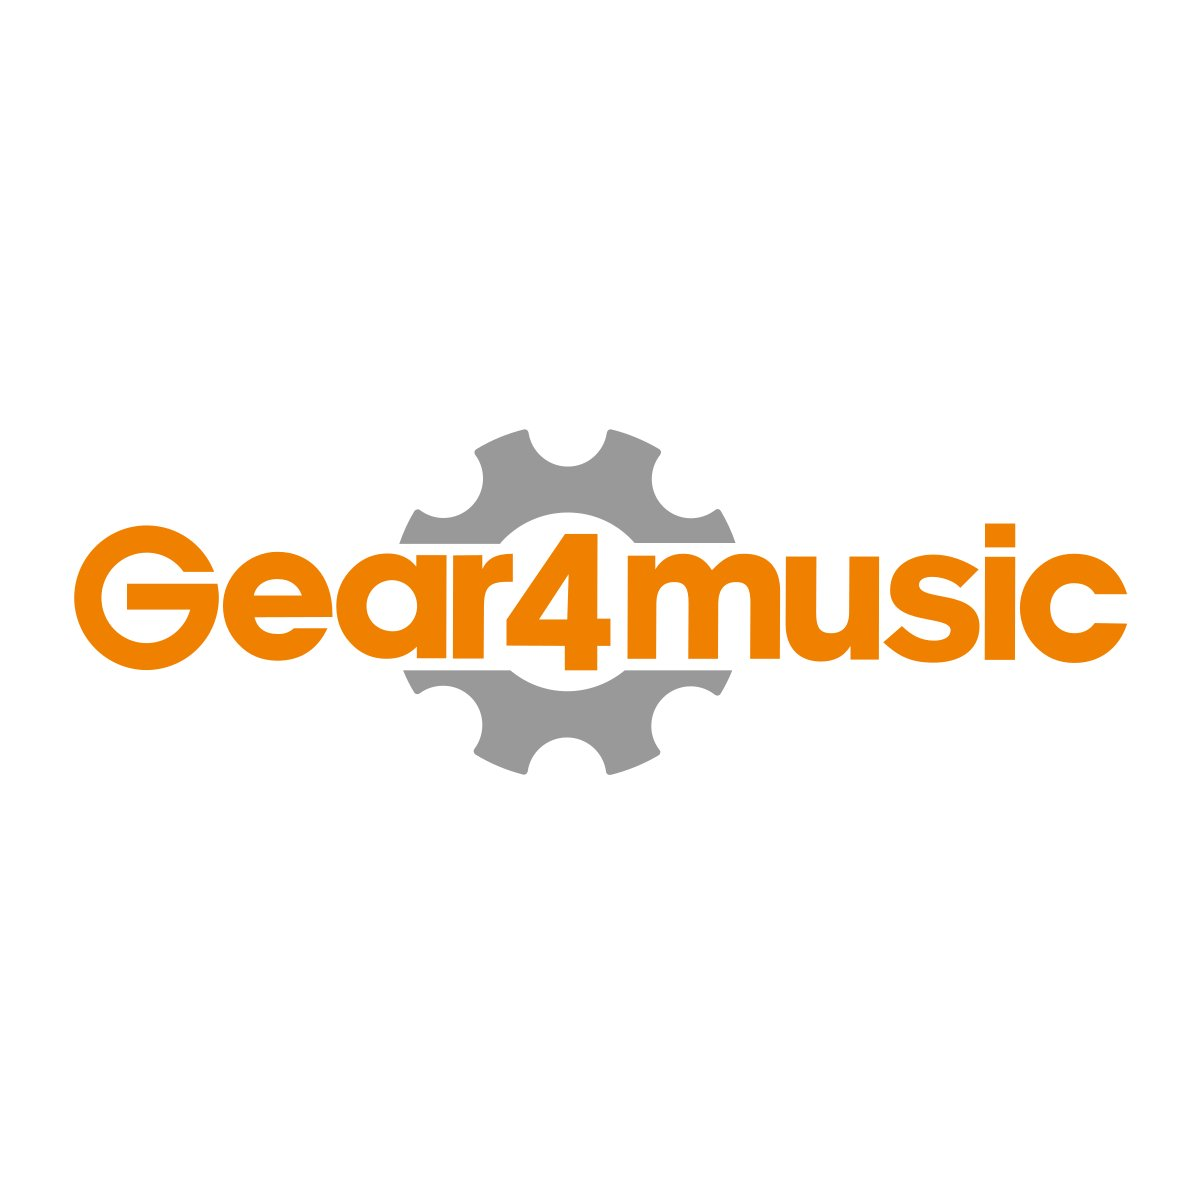 Coppergate Professional Cornet by Gear4music